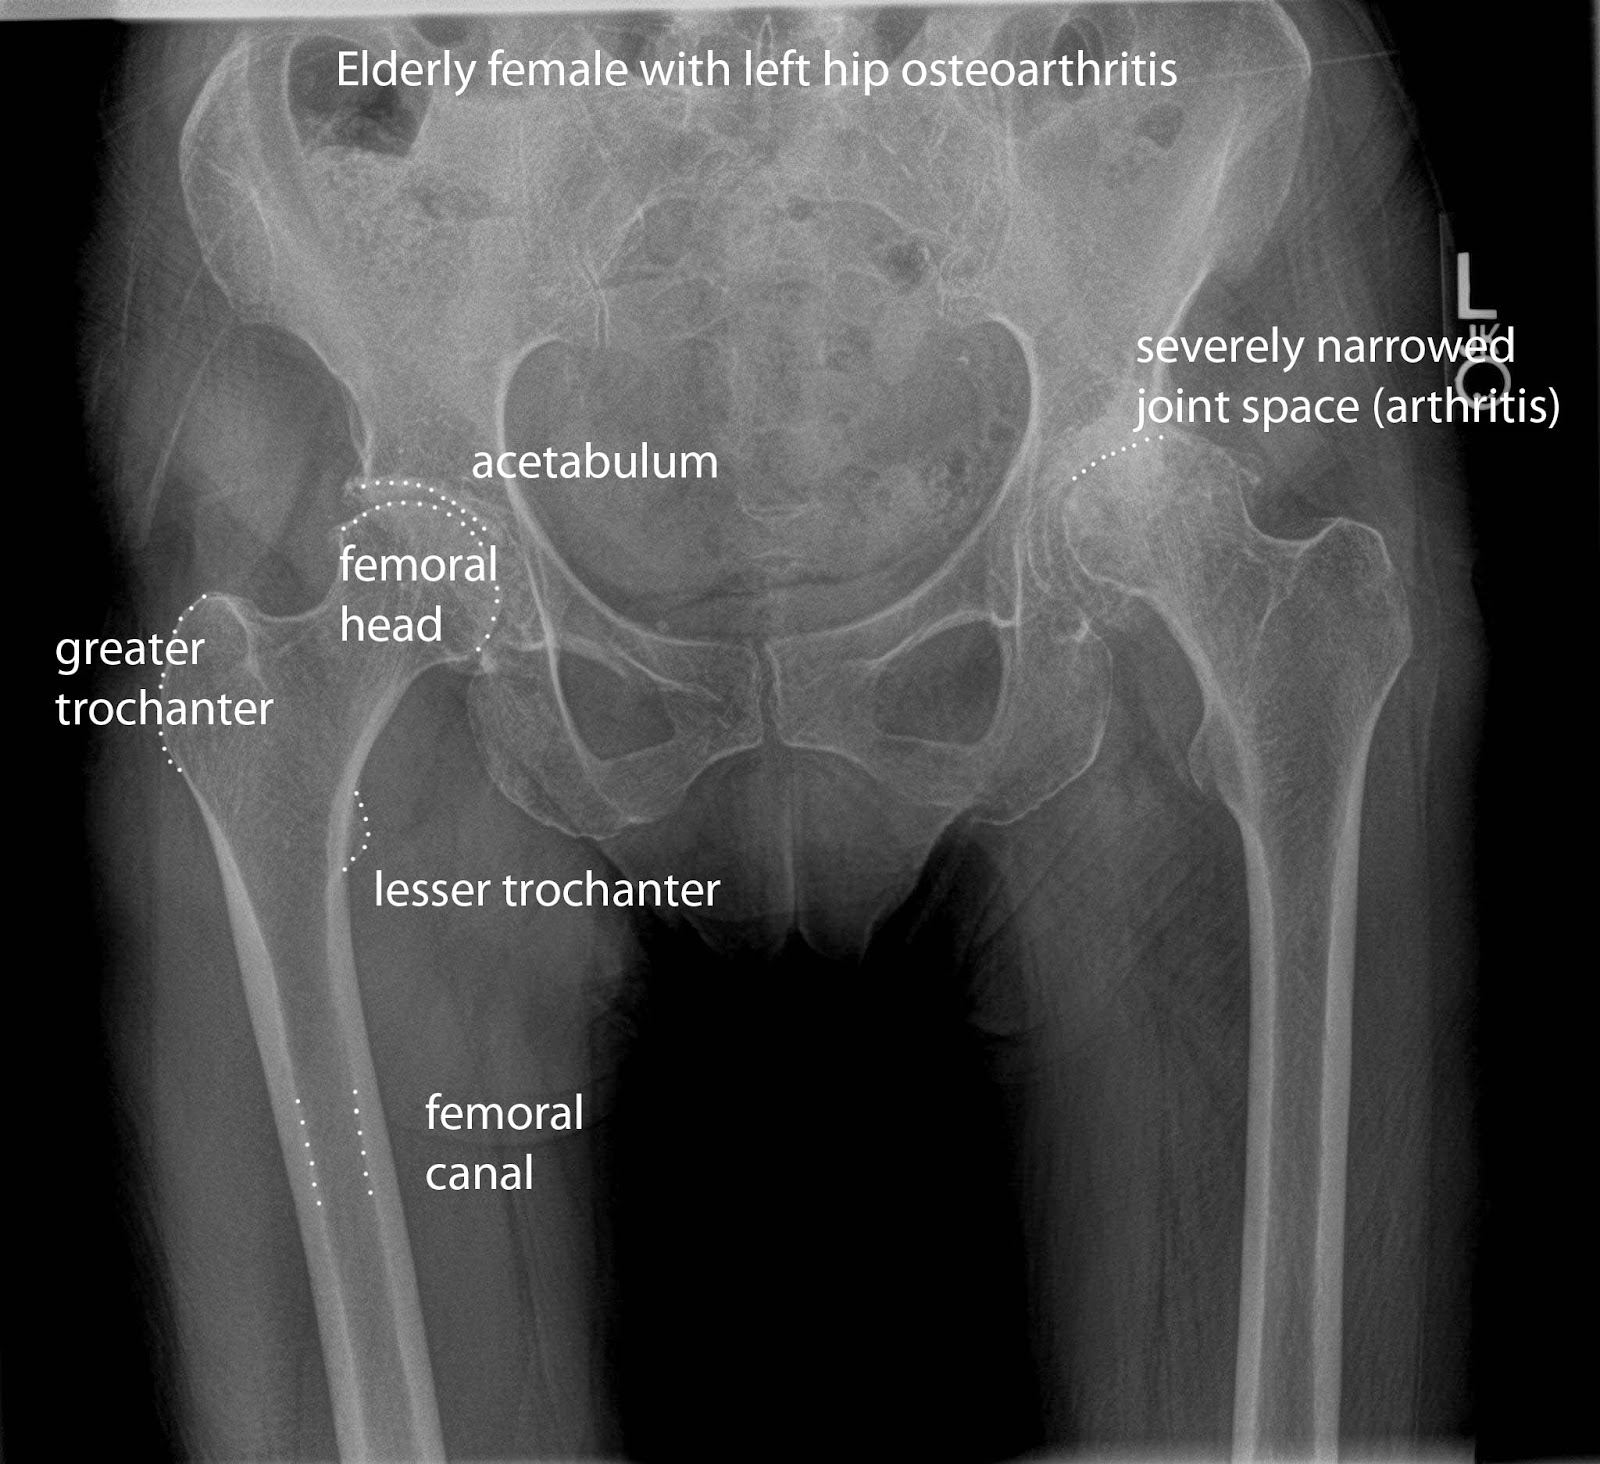 Hip joint Radiologyanatomy | Radiology Anatomy Images